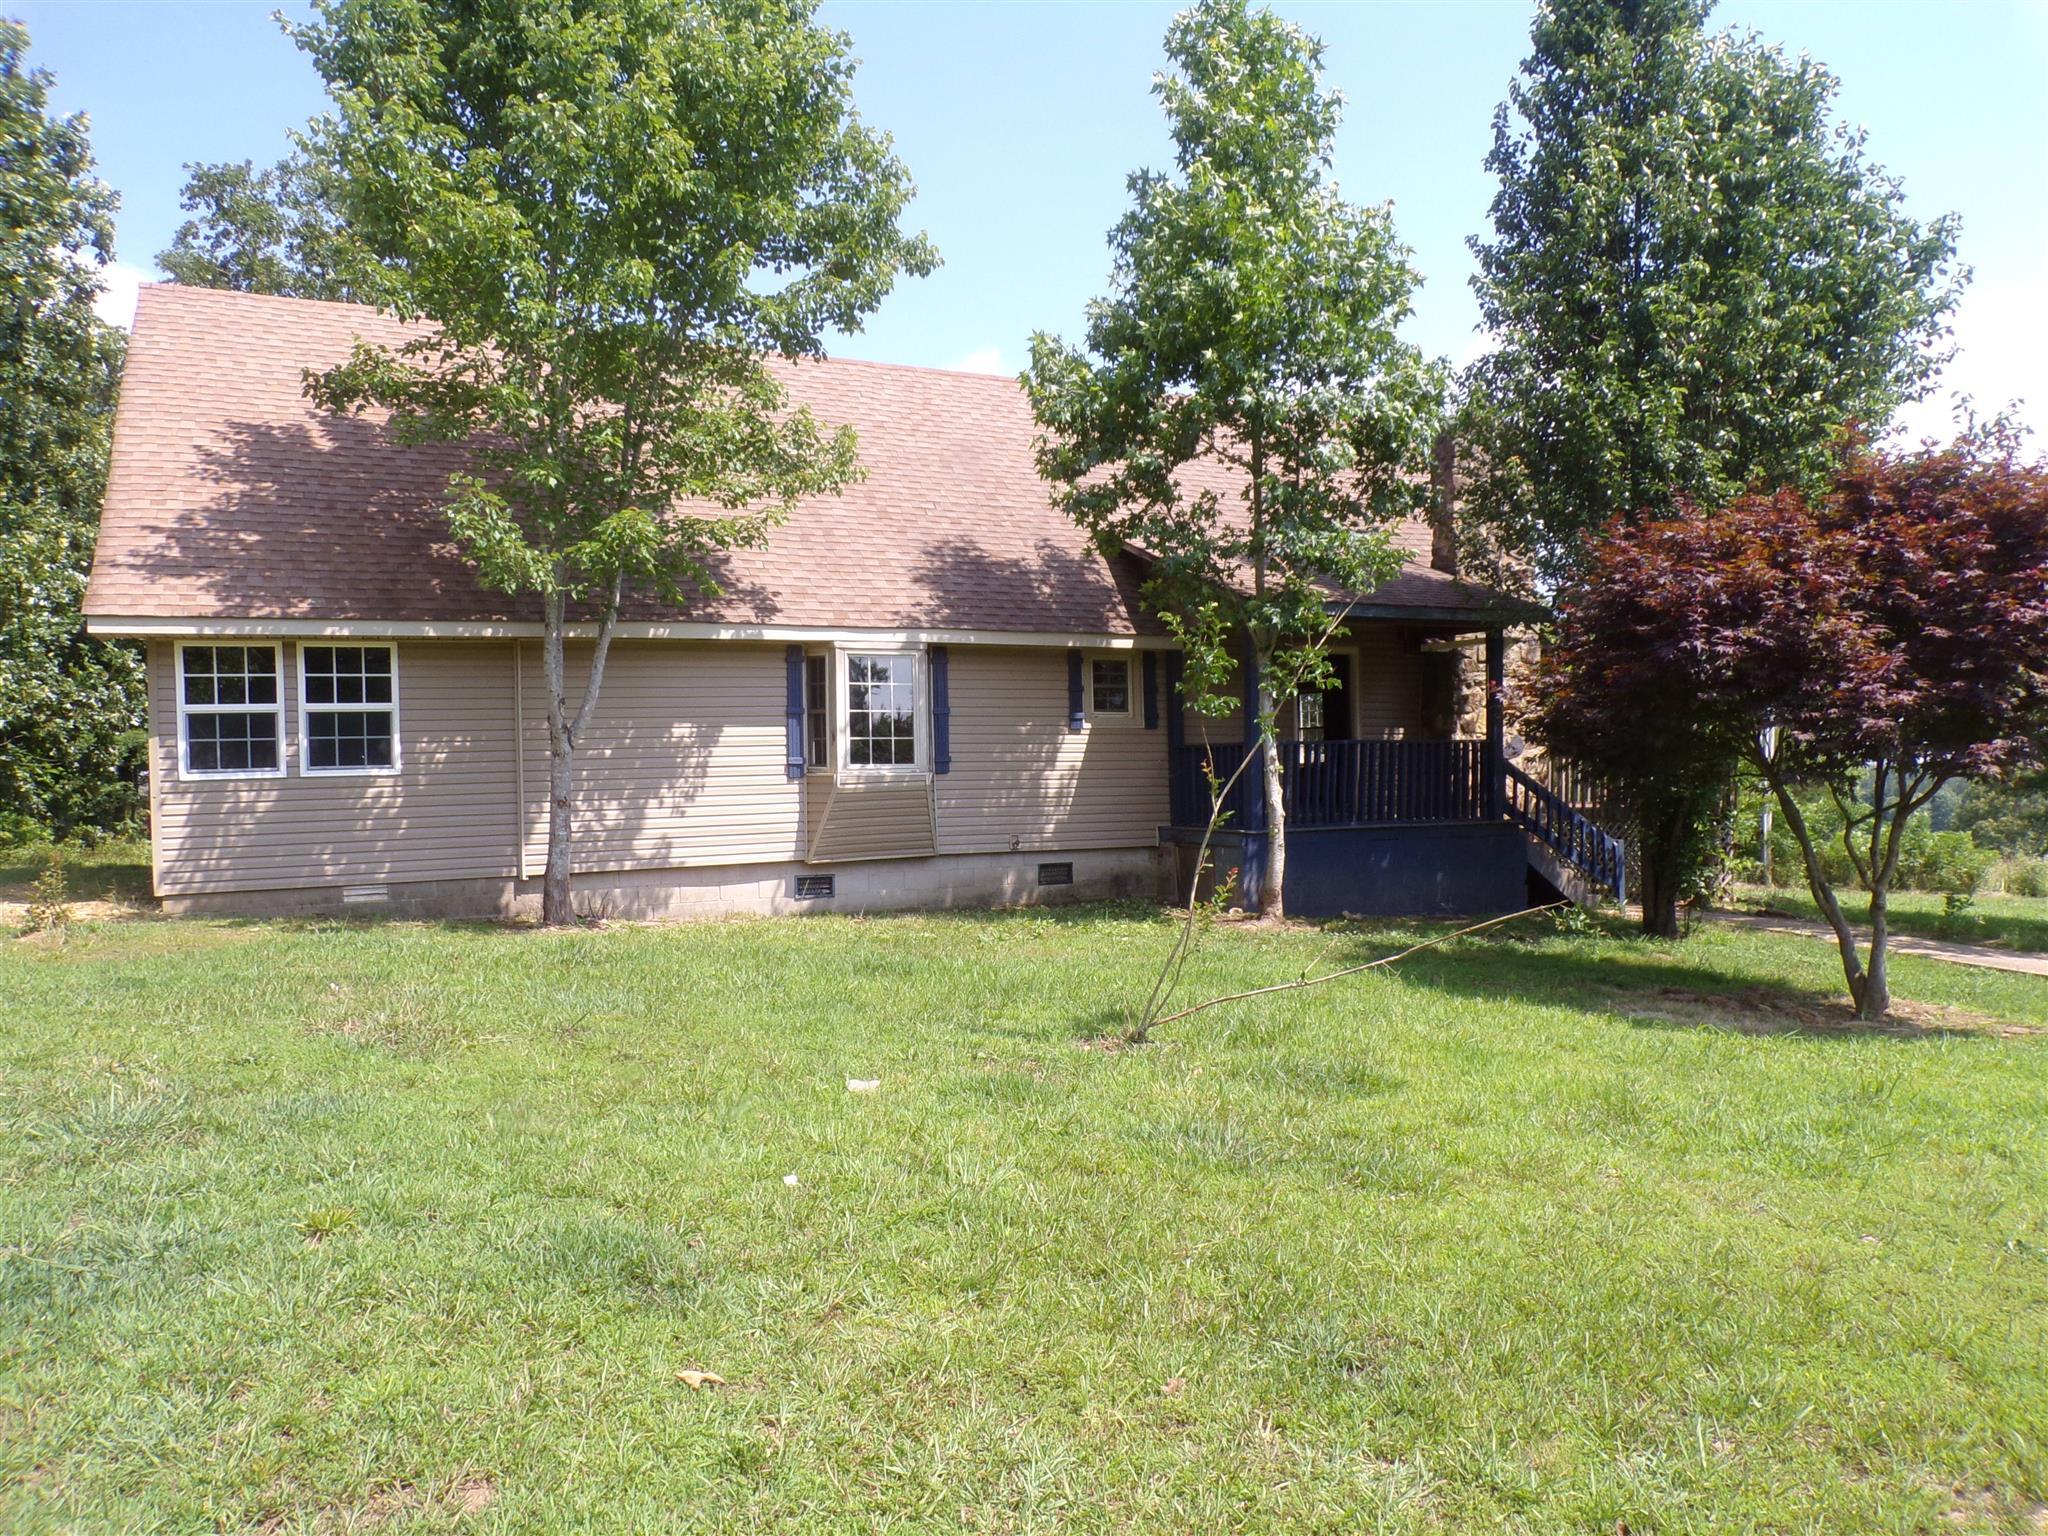 1075 Tennessee Ln, Iron City, TN 38463 - Iron City, TN real estate listing